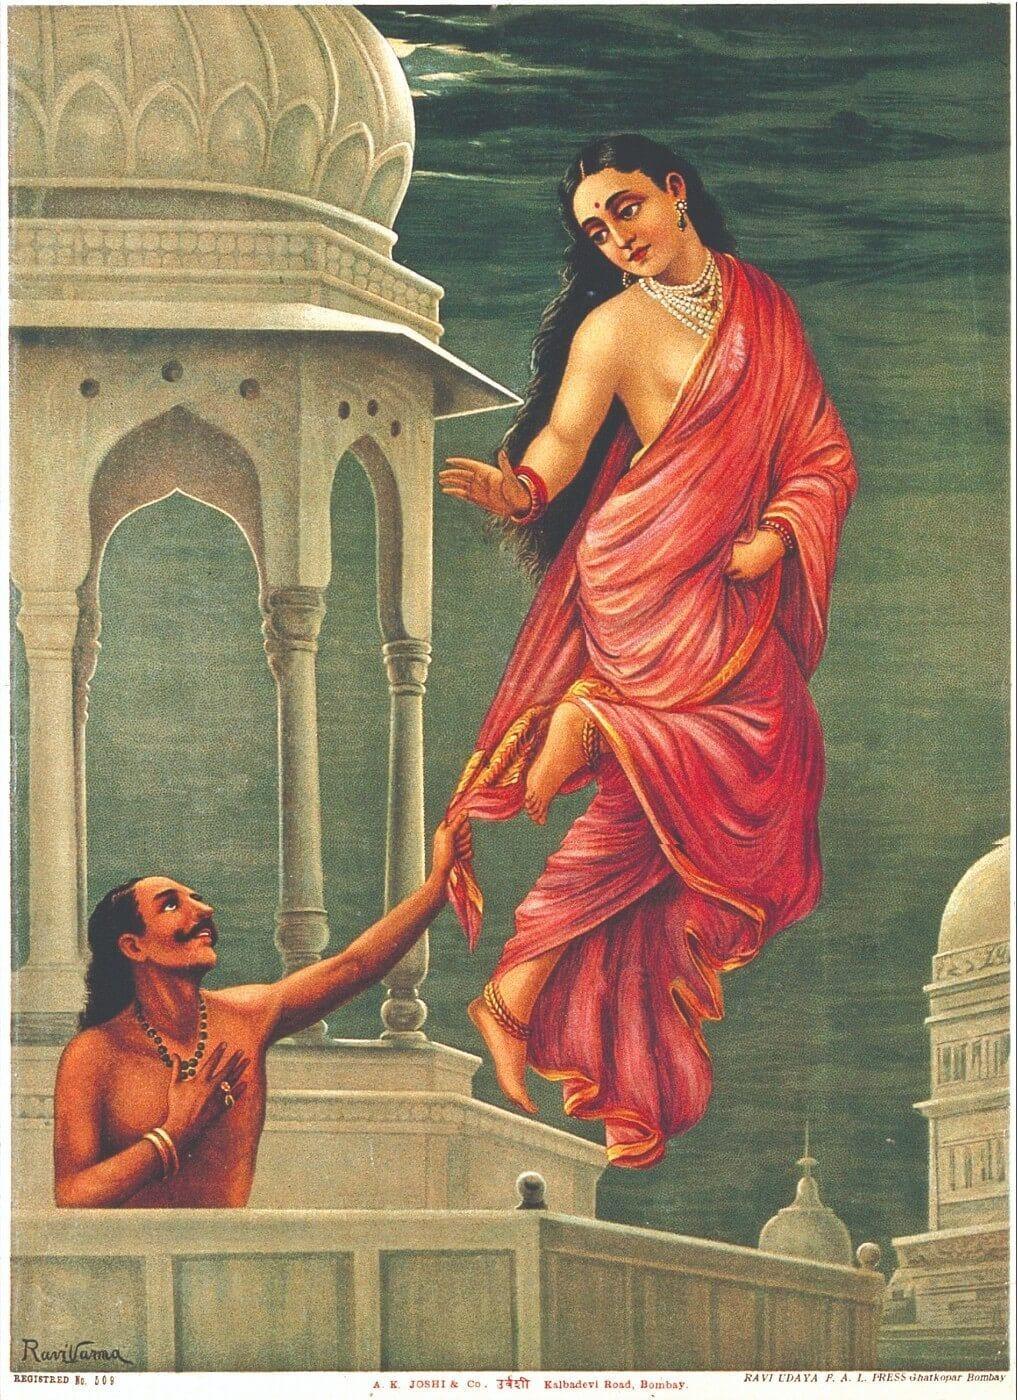 Apsara (Celestial Nymph) Urvashi and King Pururavas - Raja Ravi Varma  Chromolithograph Print - Indian Masters Painting - Canvas Prints by Raja  Ravi Varma | Buy Posters, Frames, Canvas & Digital Art